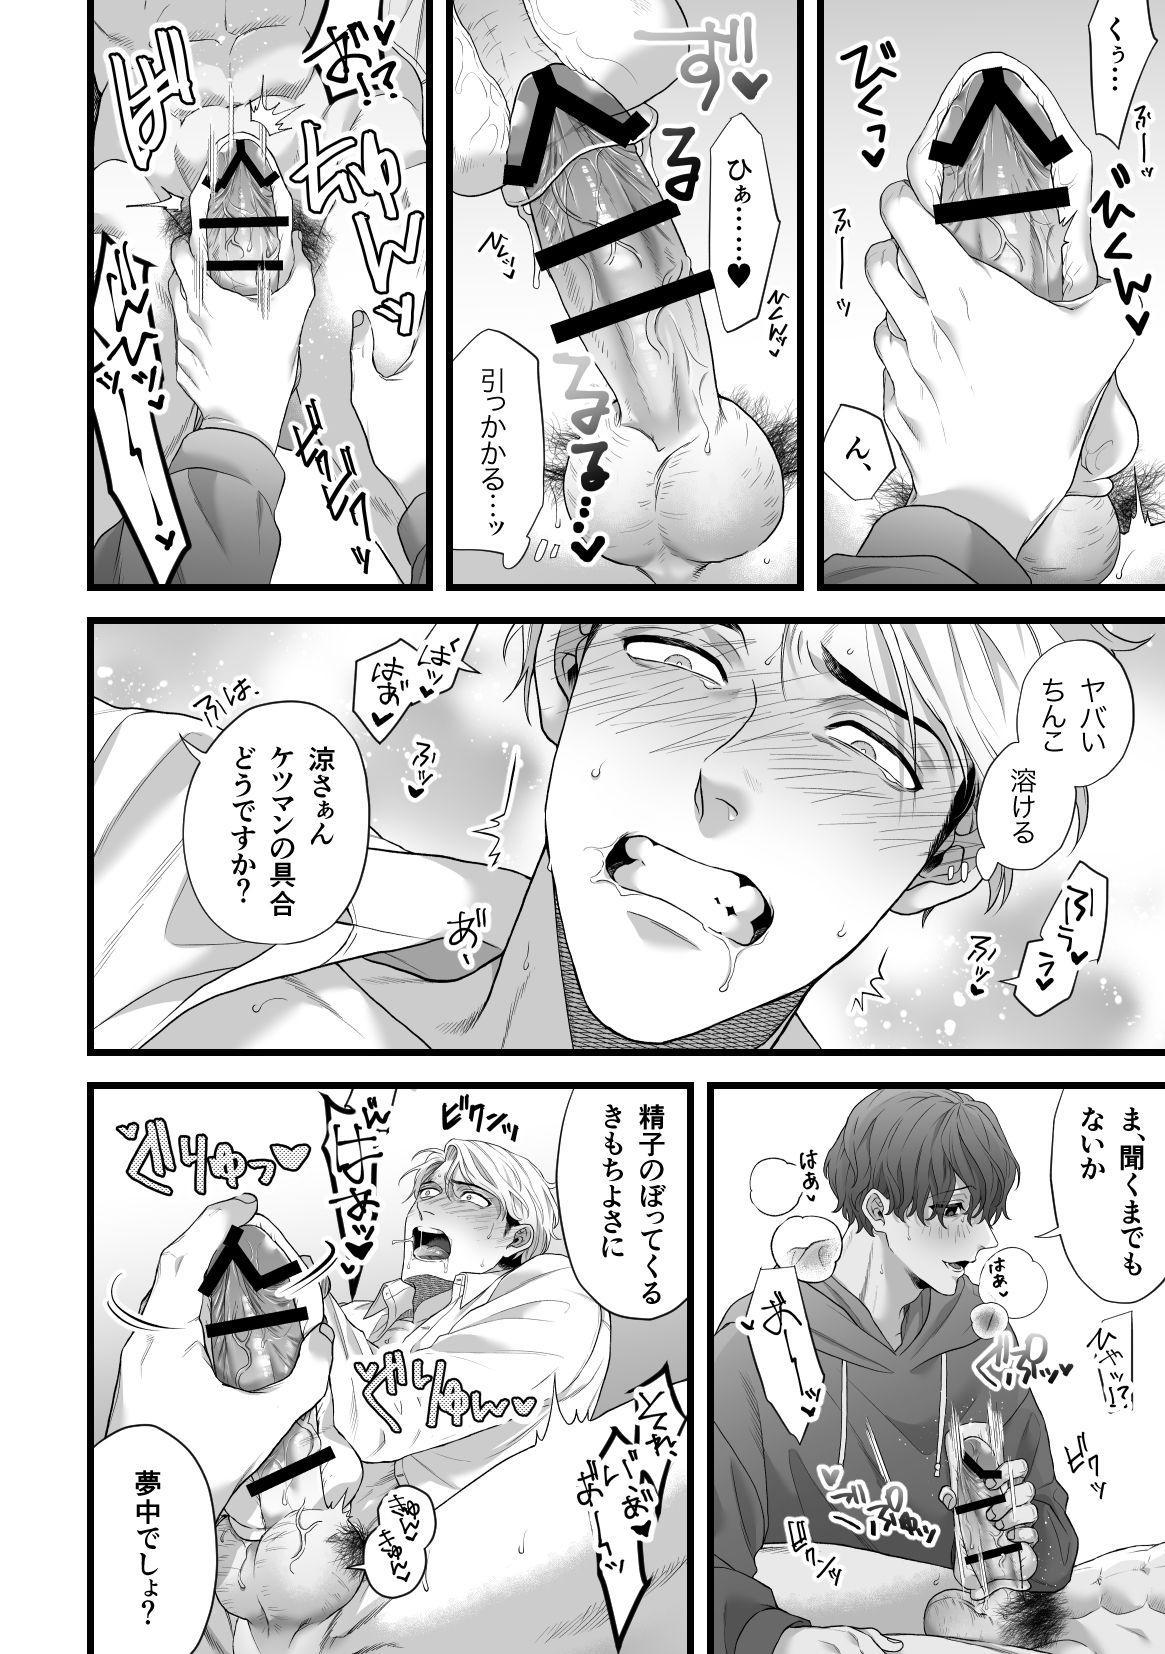 Gikei Ryoujoku 15